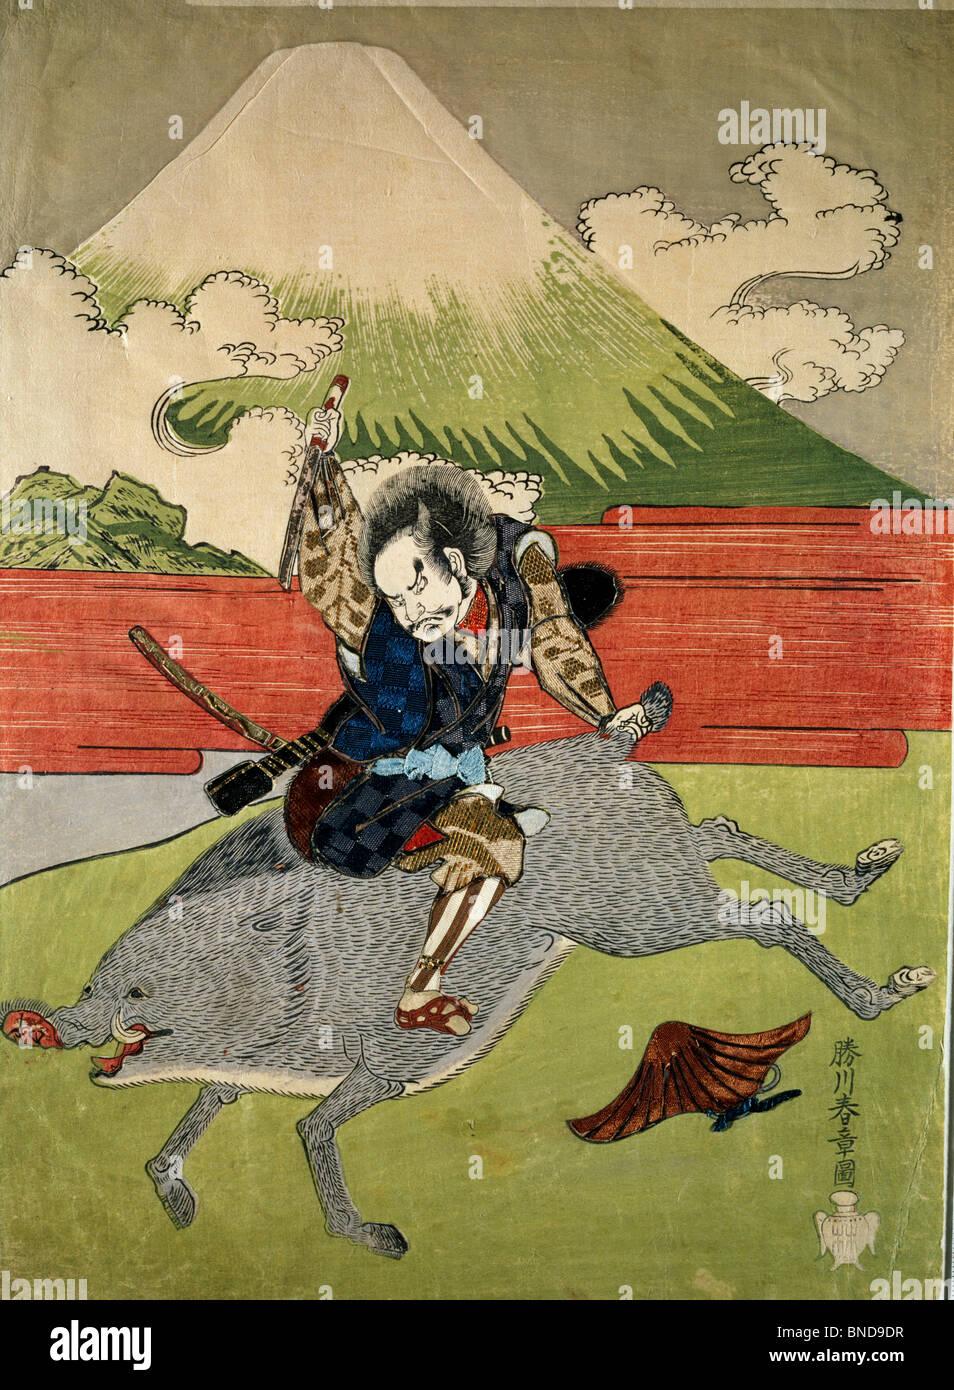 Man on Wild Boar, Japanese woodcut - Stock Image